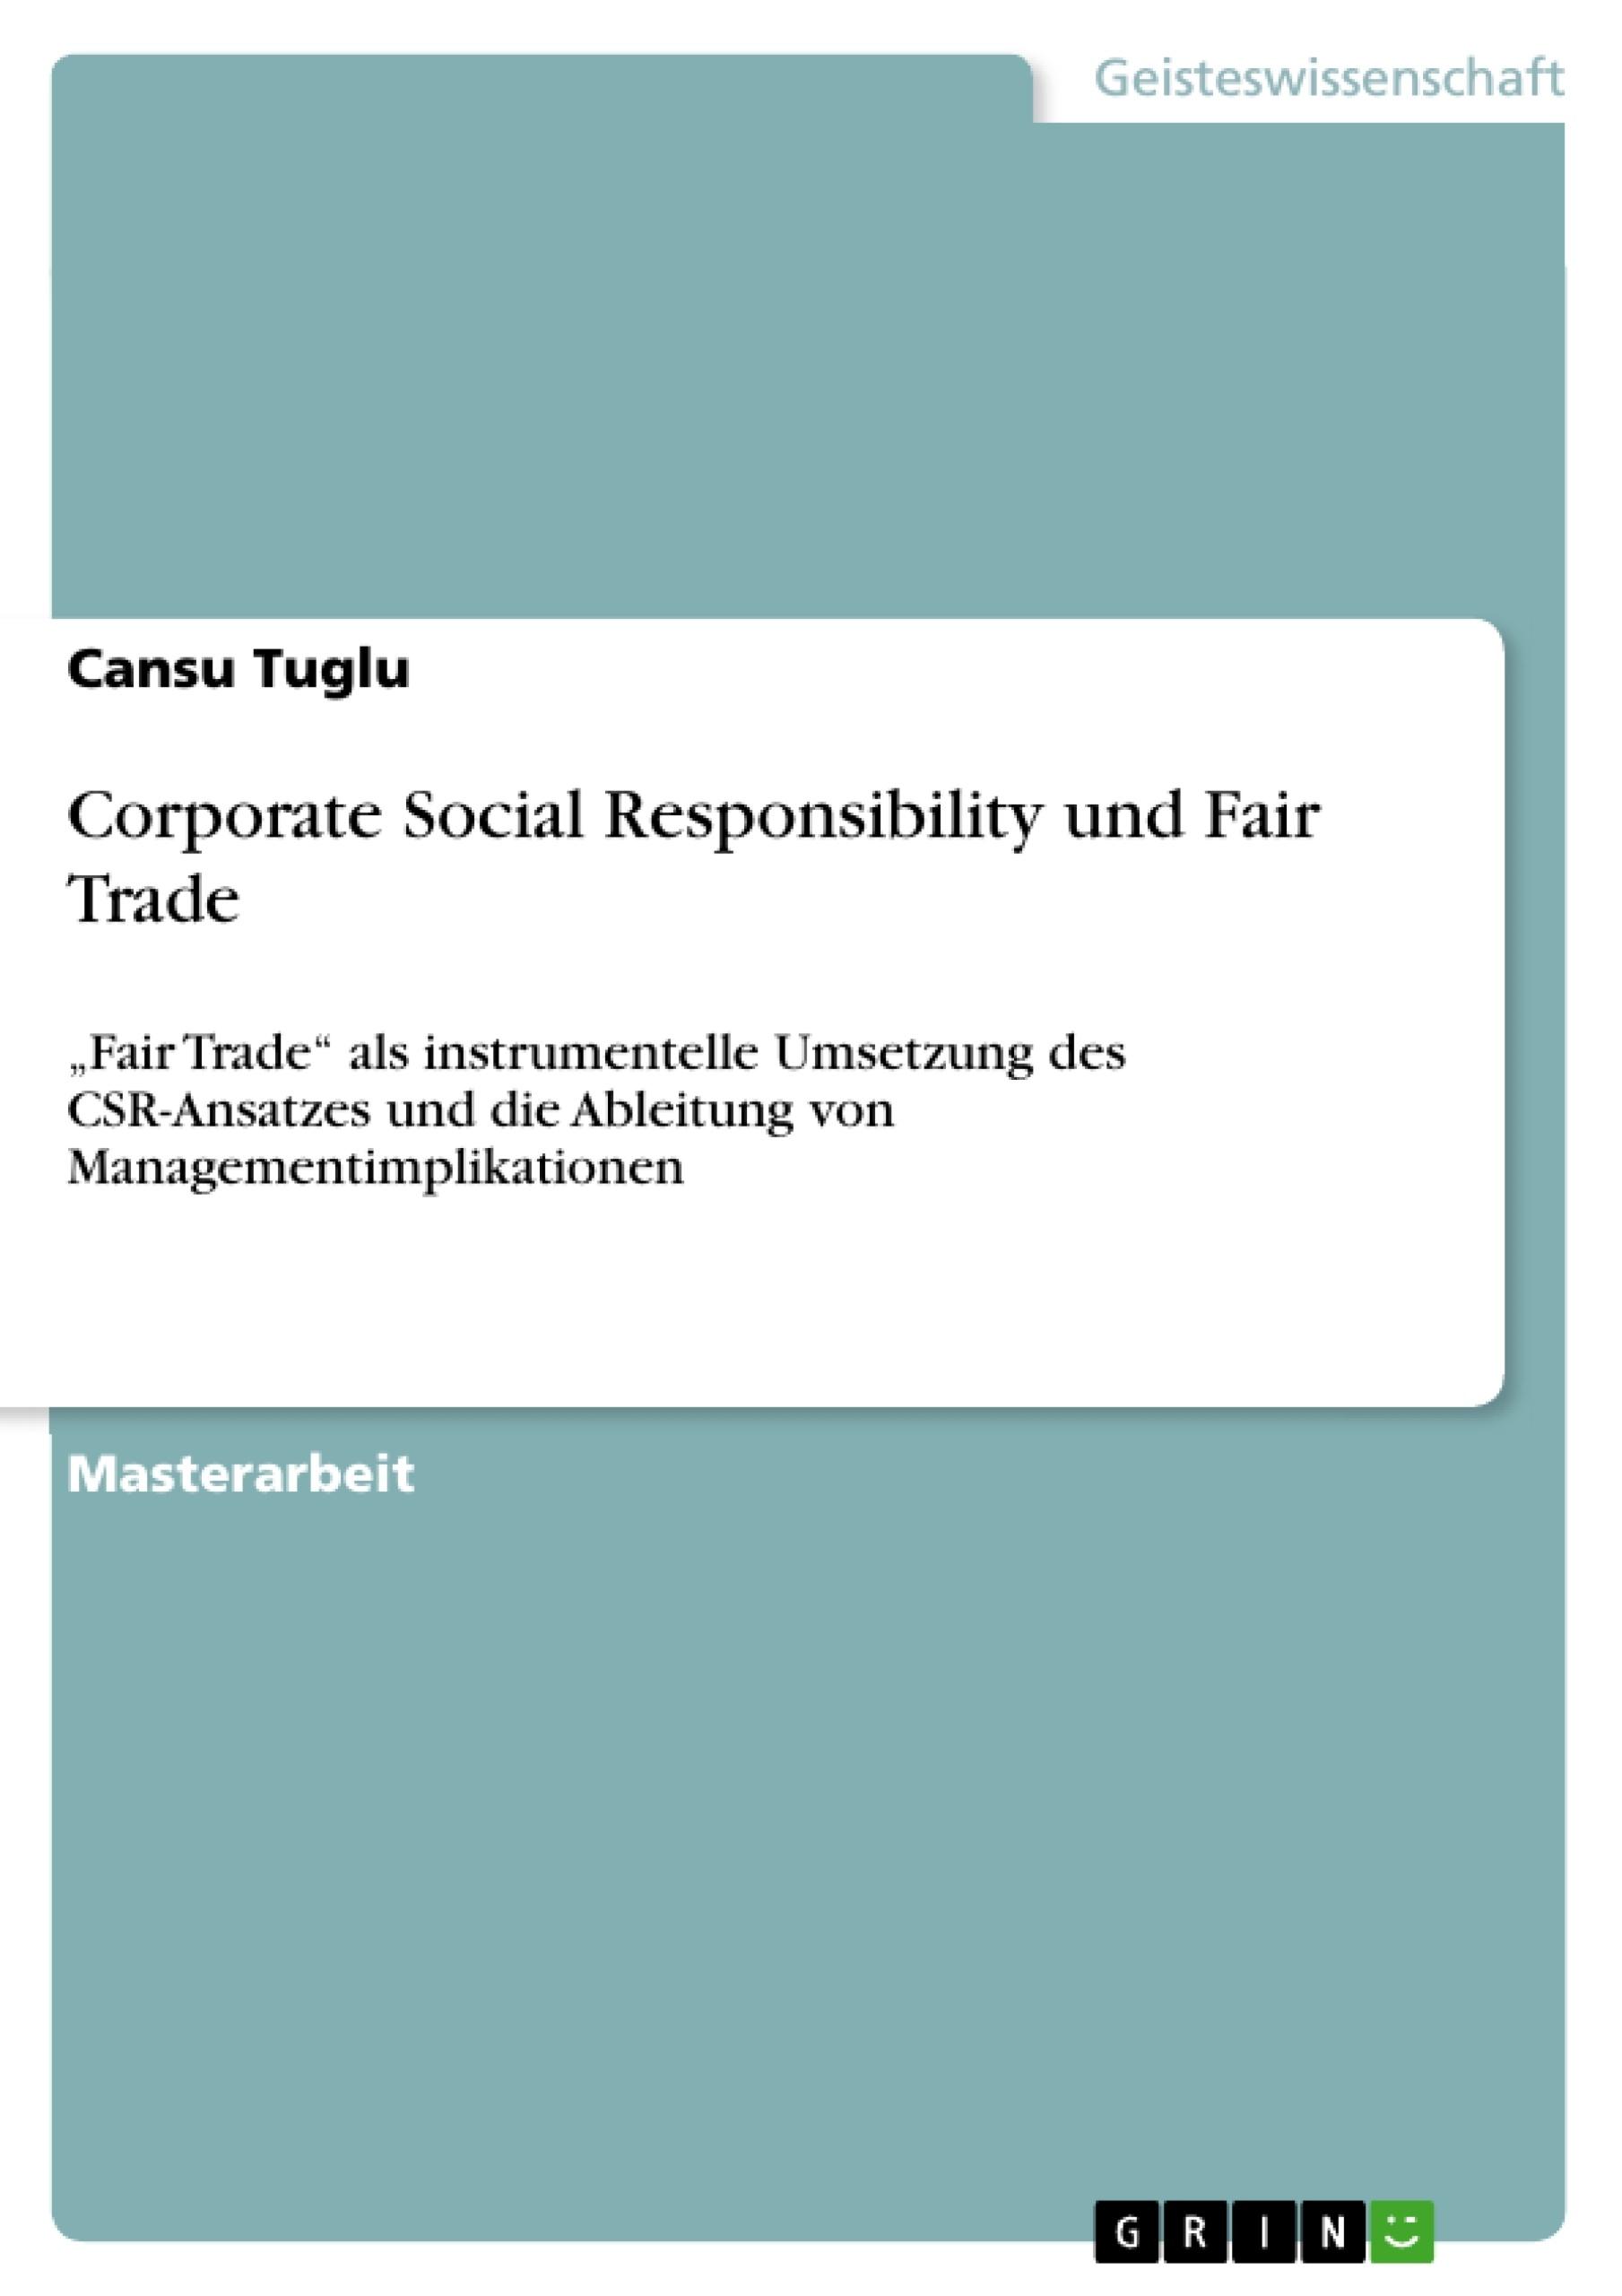 Titel: Corporate Social Responsibility und Fair Trade